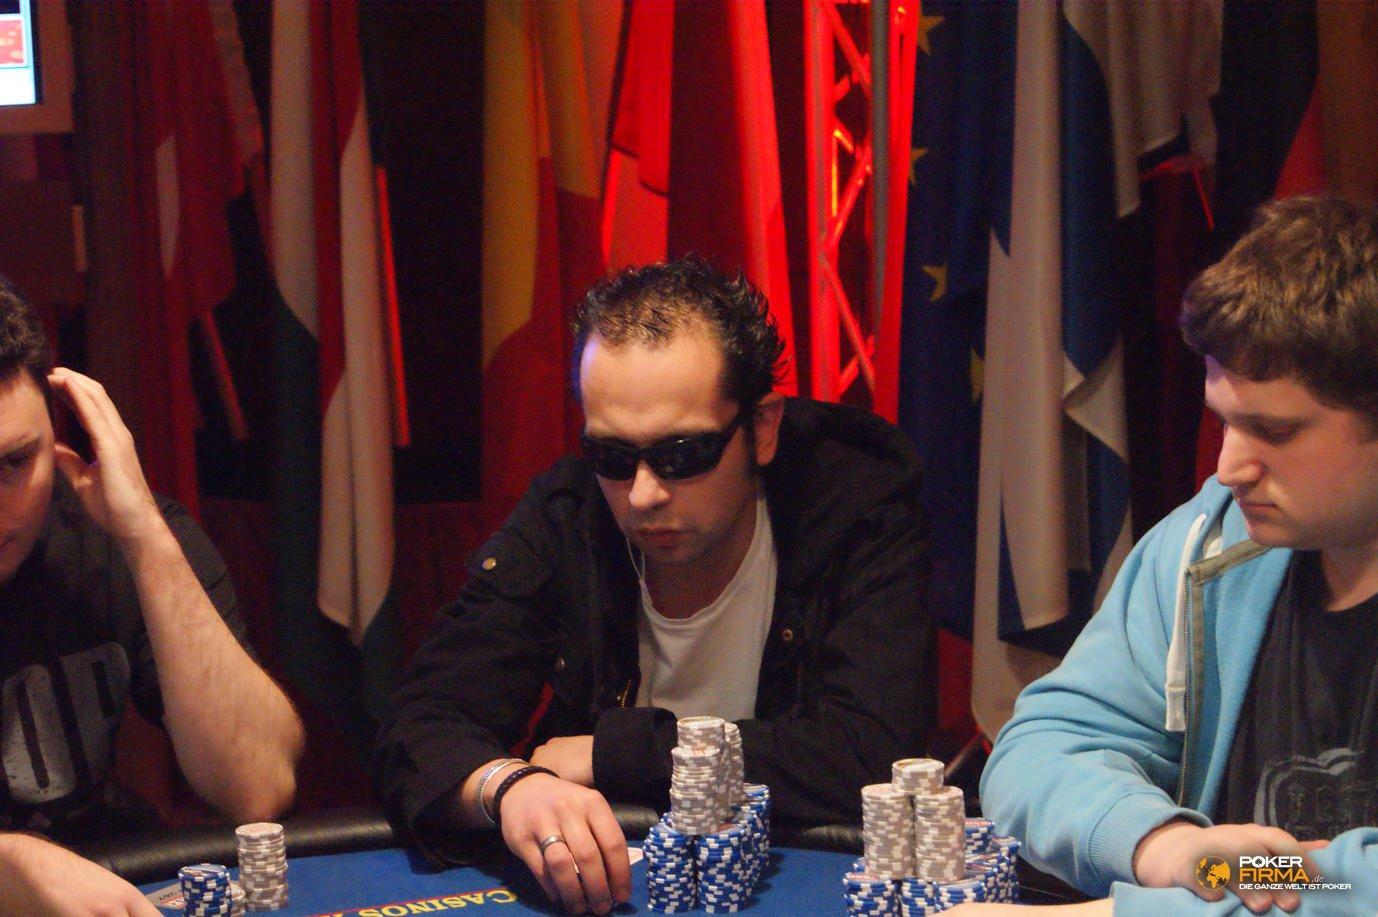 Poker_EM_2000_NLH_FT_271011_Alex_Boes